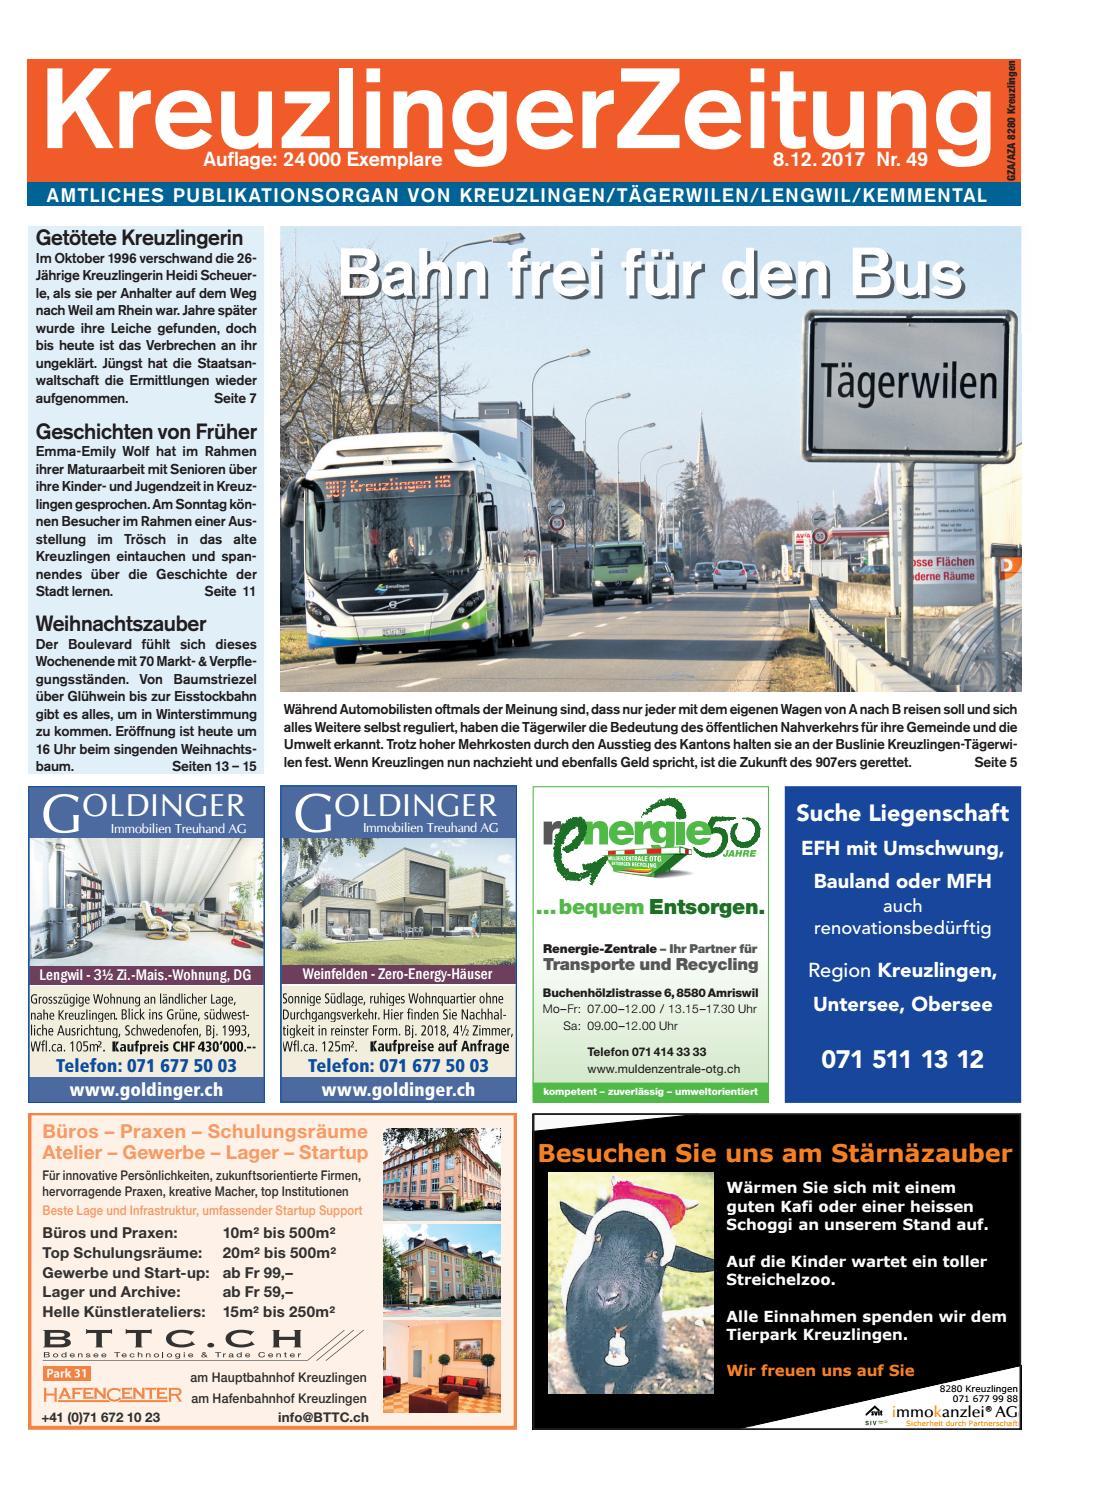 Kreuzlinger Zeitung vom 20. Mrz 2020 by KreuzlingerZeitung